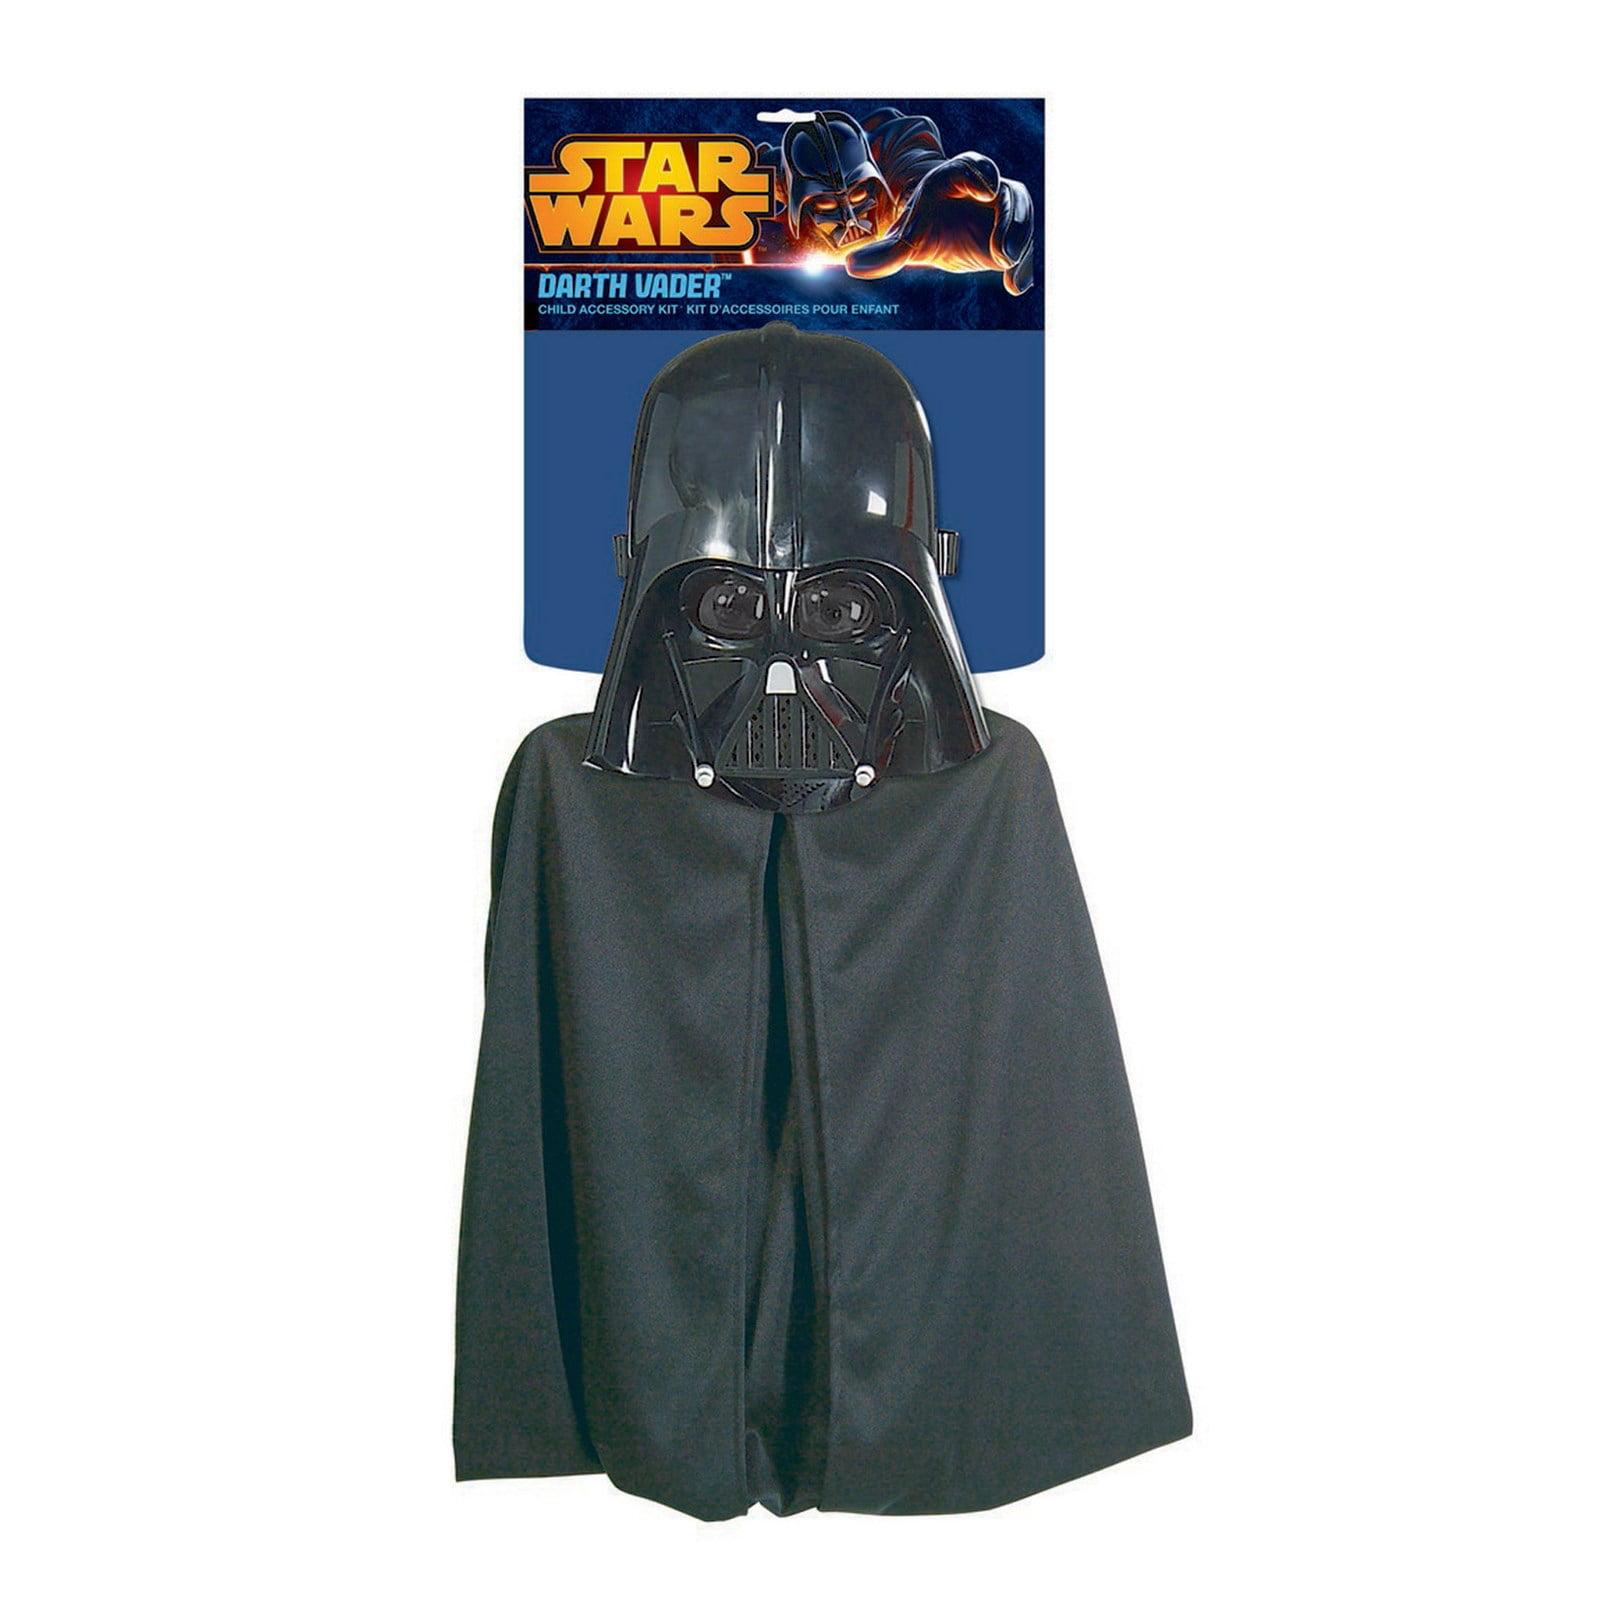 Star Wars Darth Vader Cape/Mask Halloween Costume Accessory Set